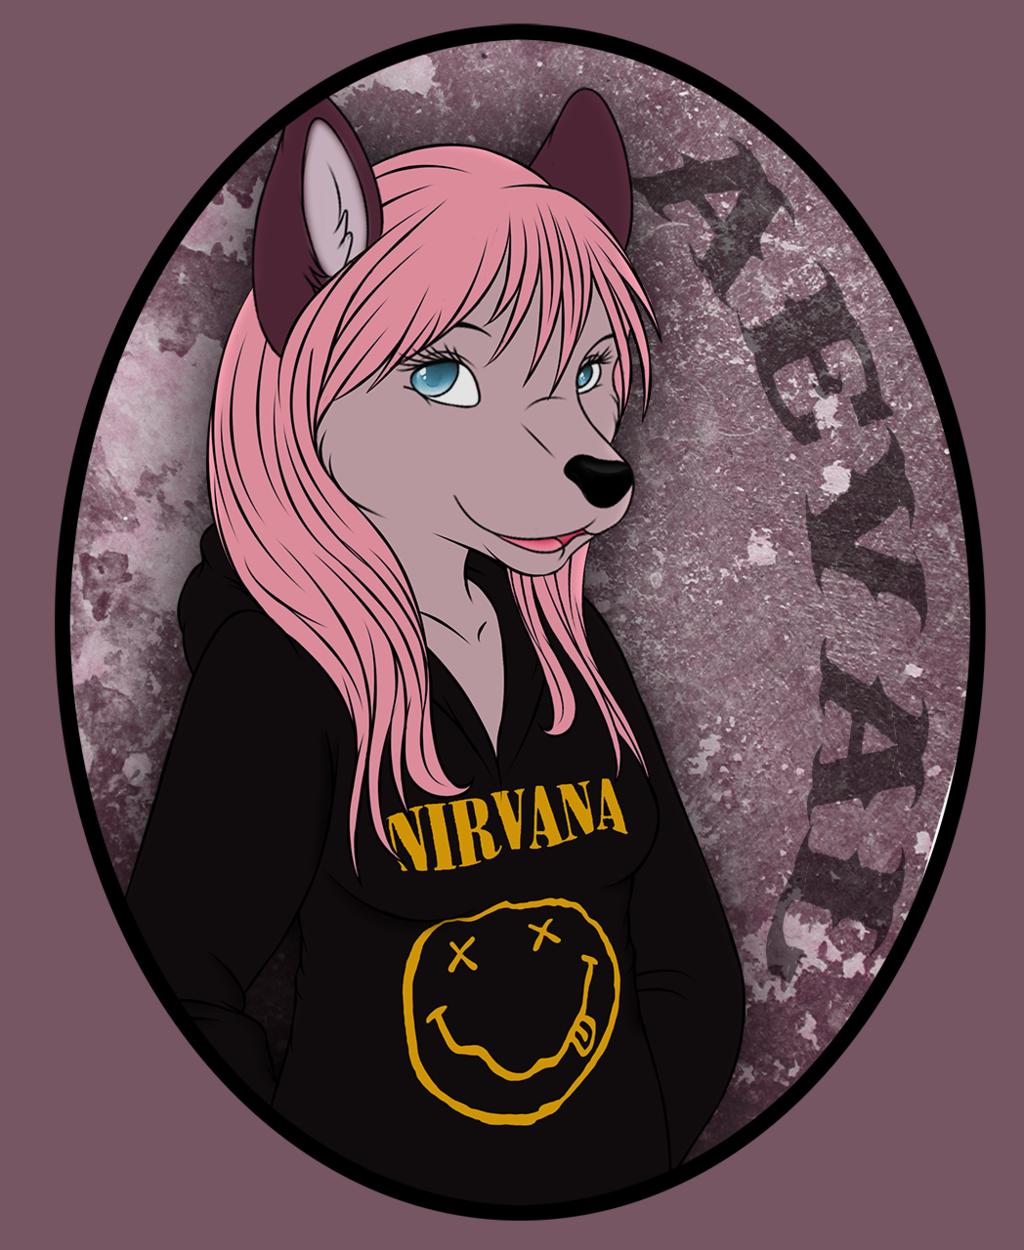 Nirvana badge